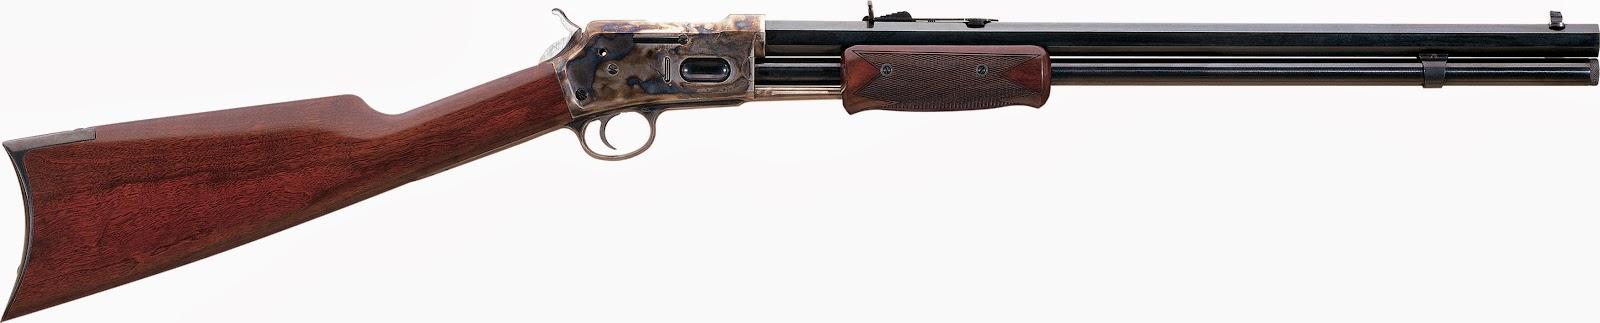 Winchester model 1890 22 short